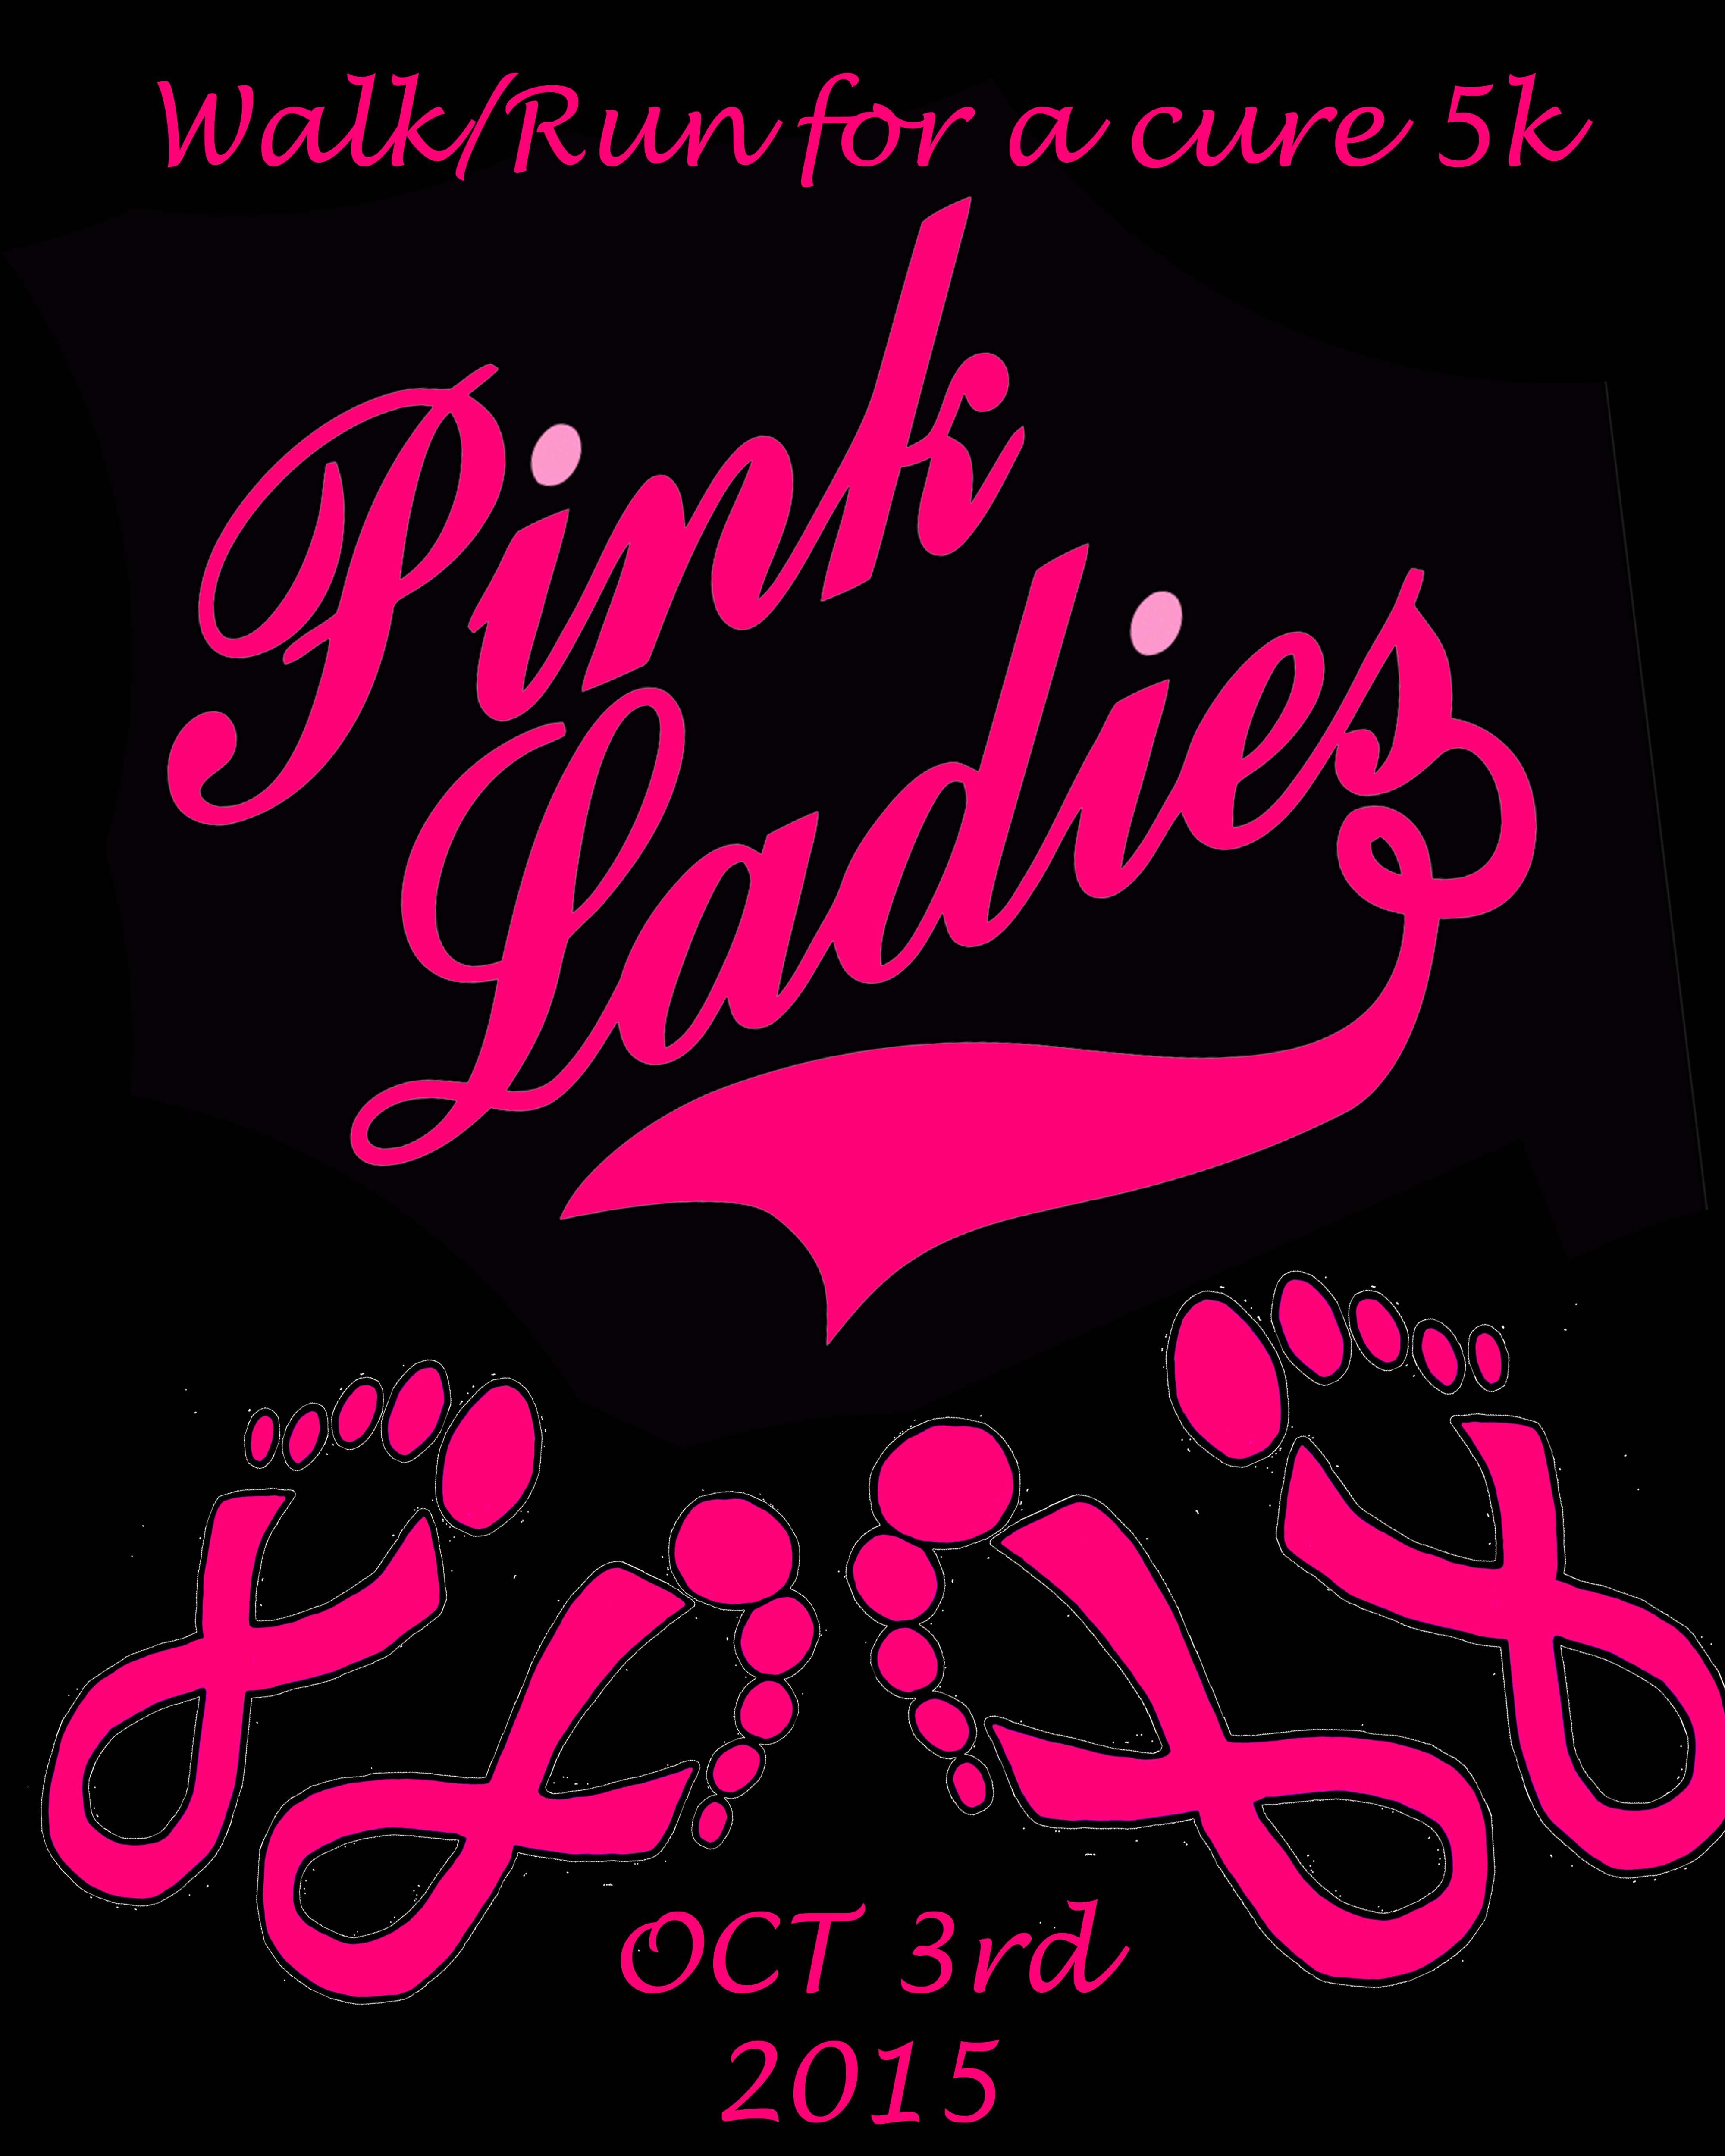 images.raceentry.com/infopages/pink-ladies-5k-runwalk-infopages-1522.jpg